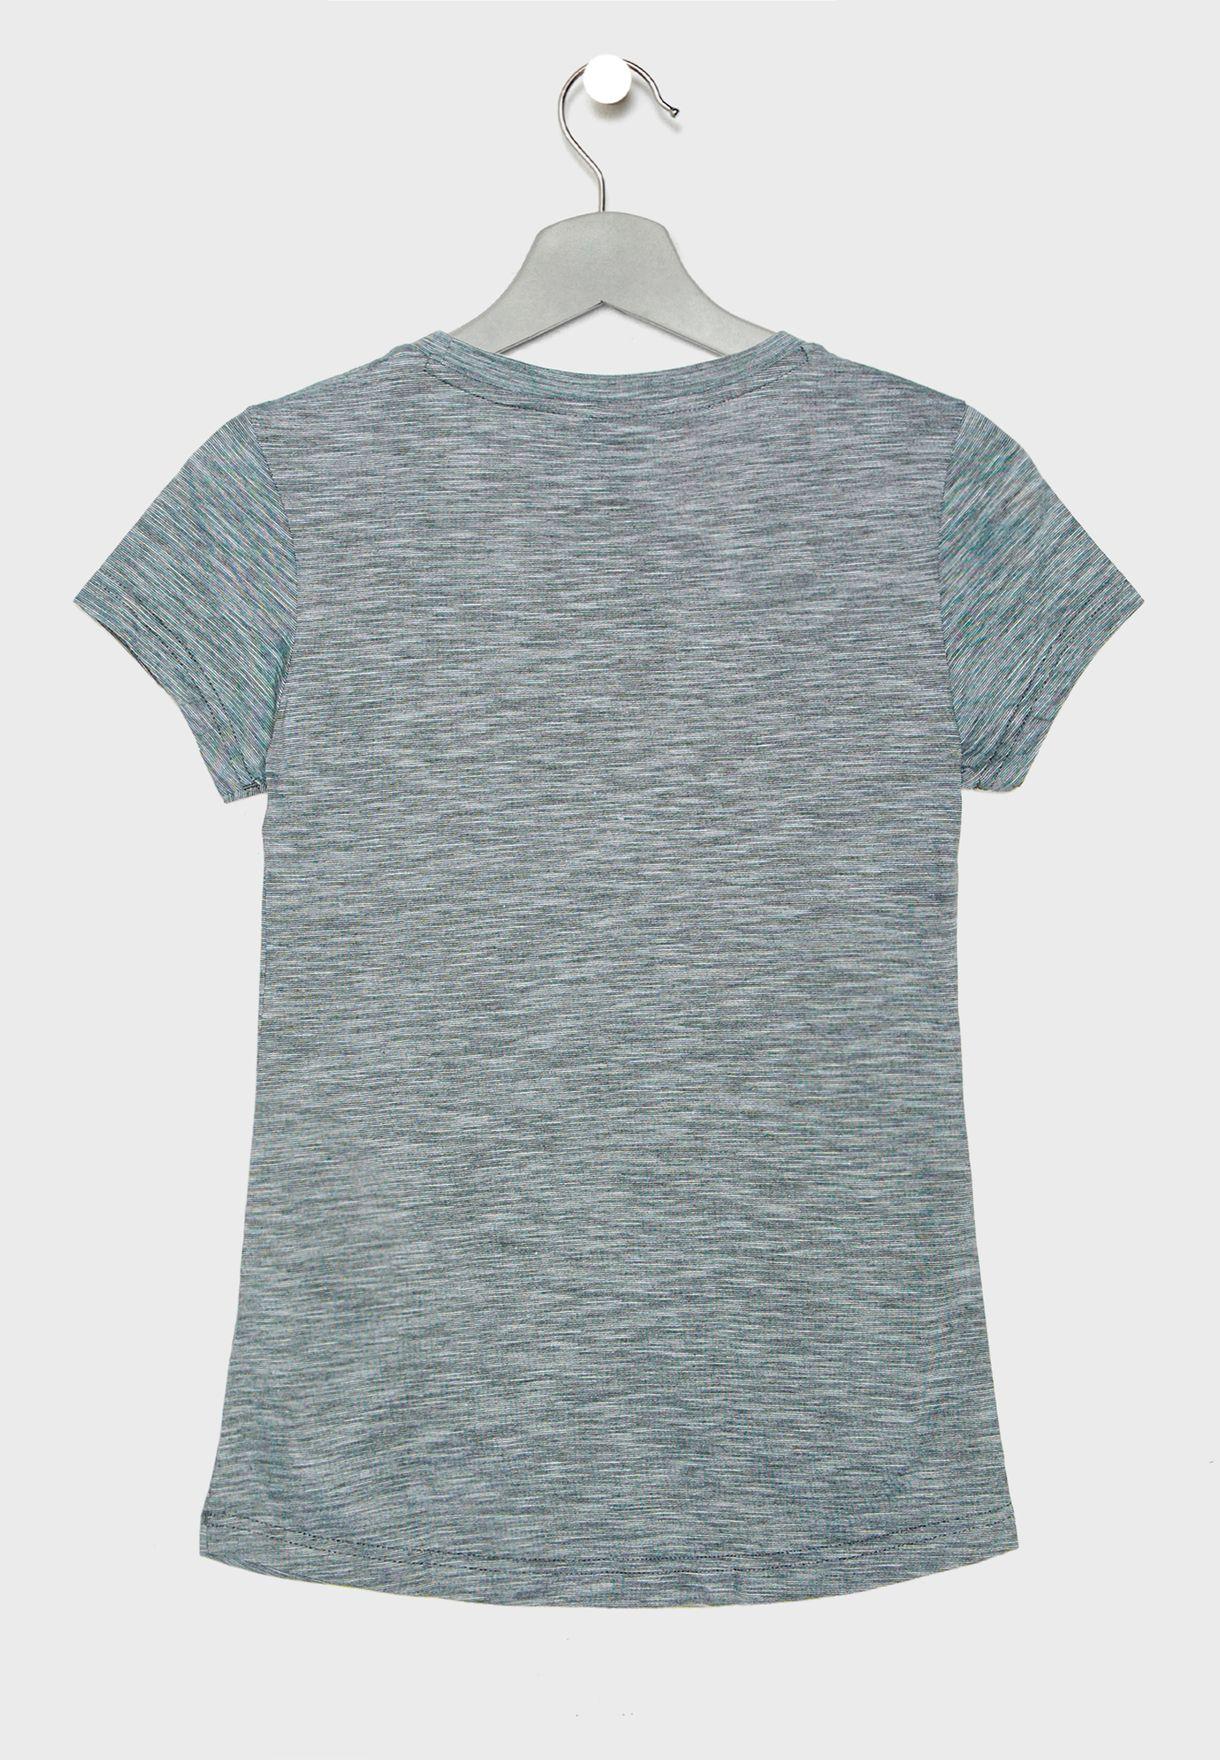 Youth ID Winner T-Shirt